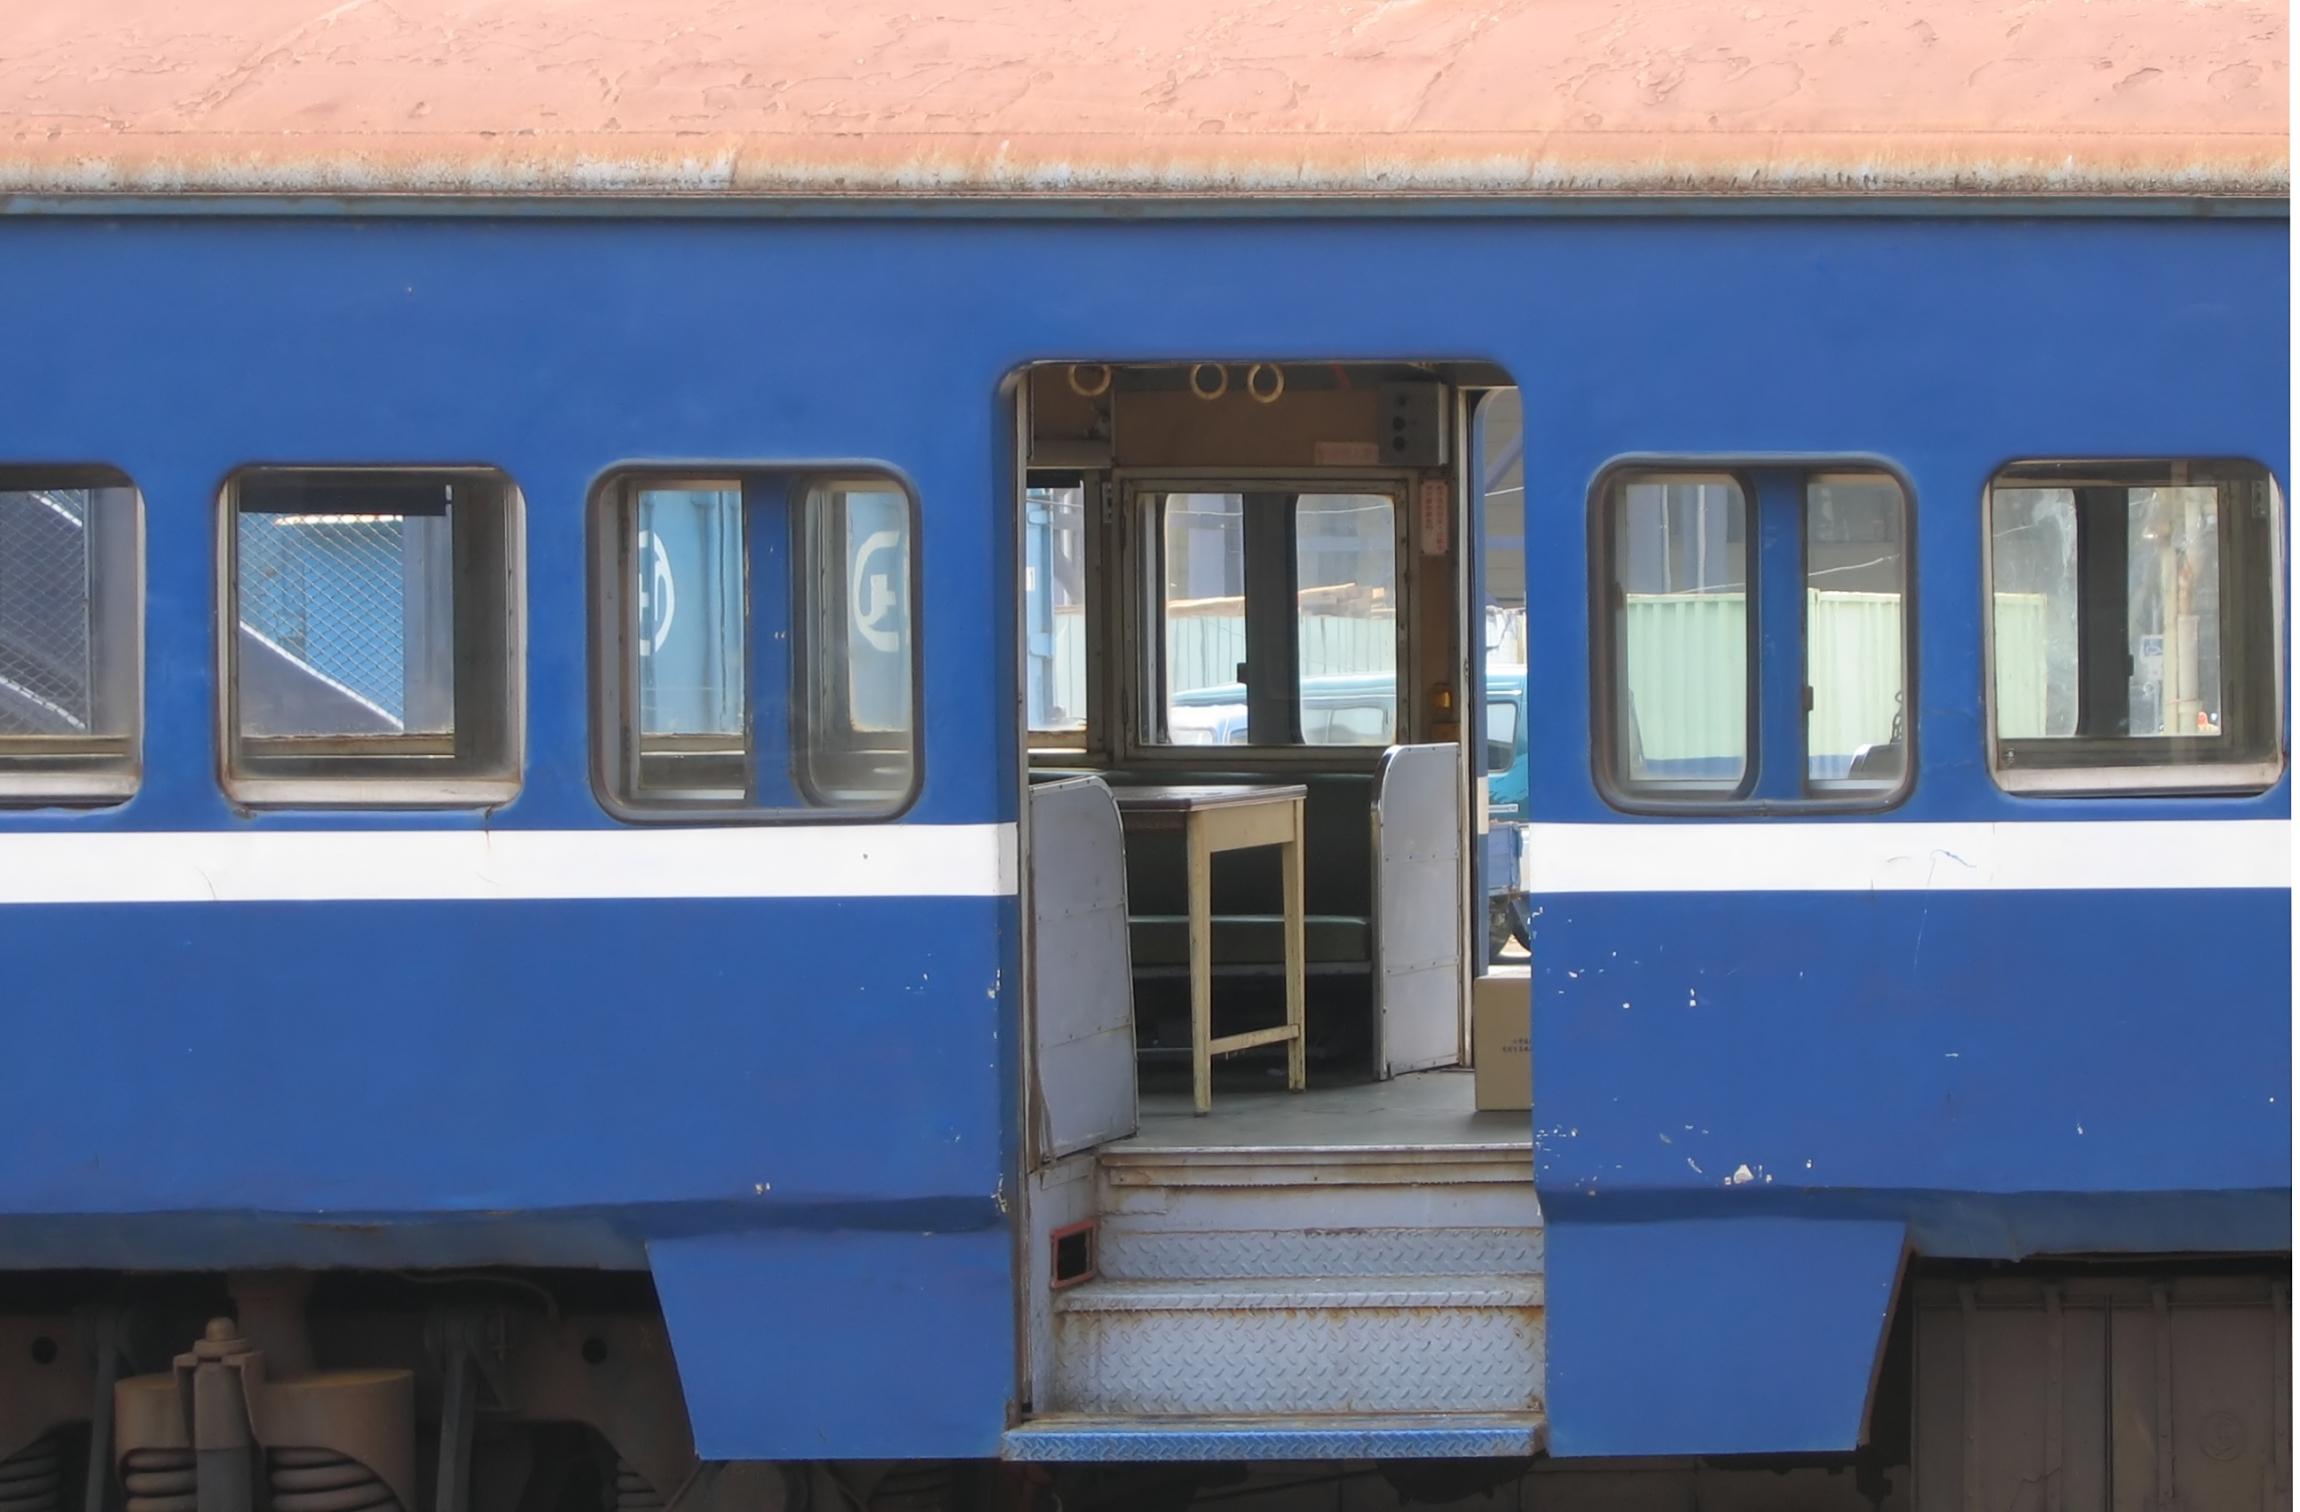 Vintage Train Carrriage, Aged, Rail, Wheels, Vintage, HQ Photo